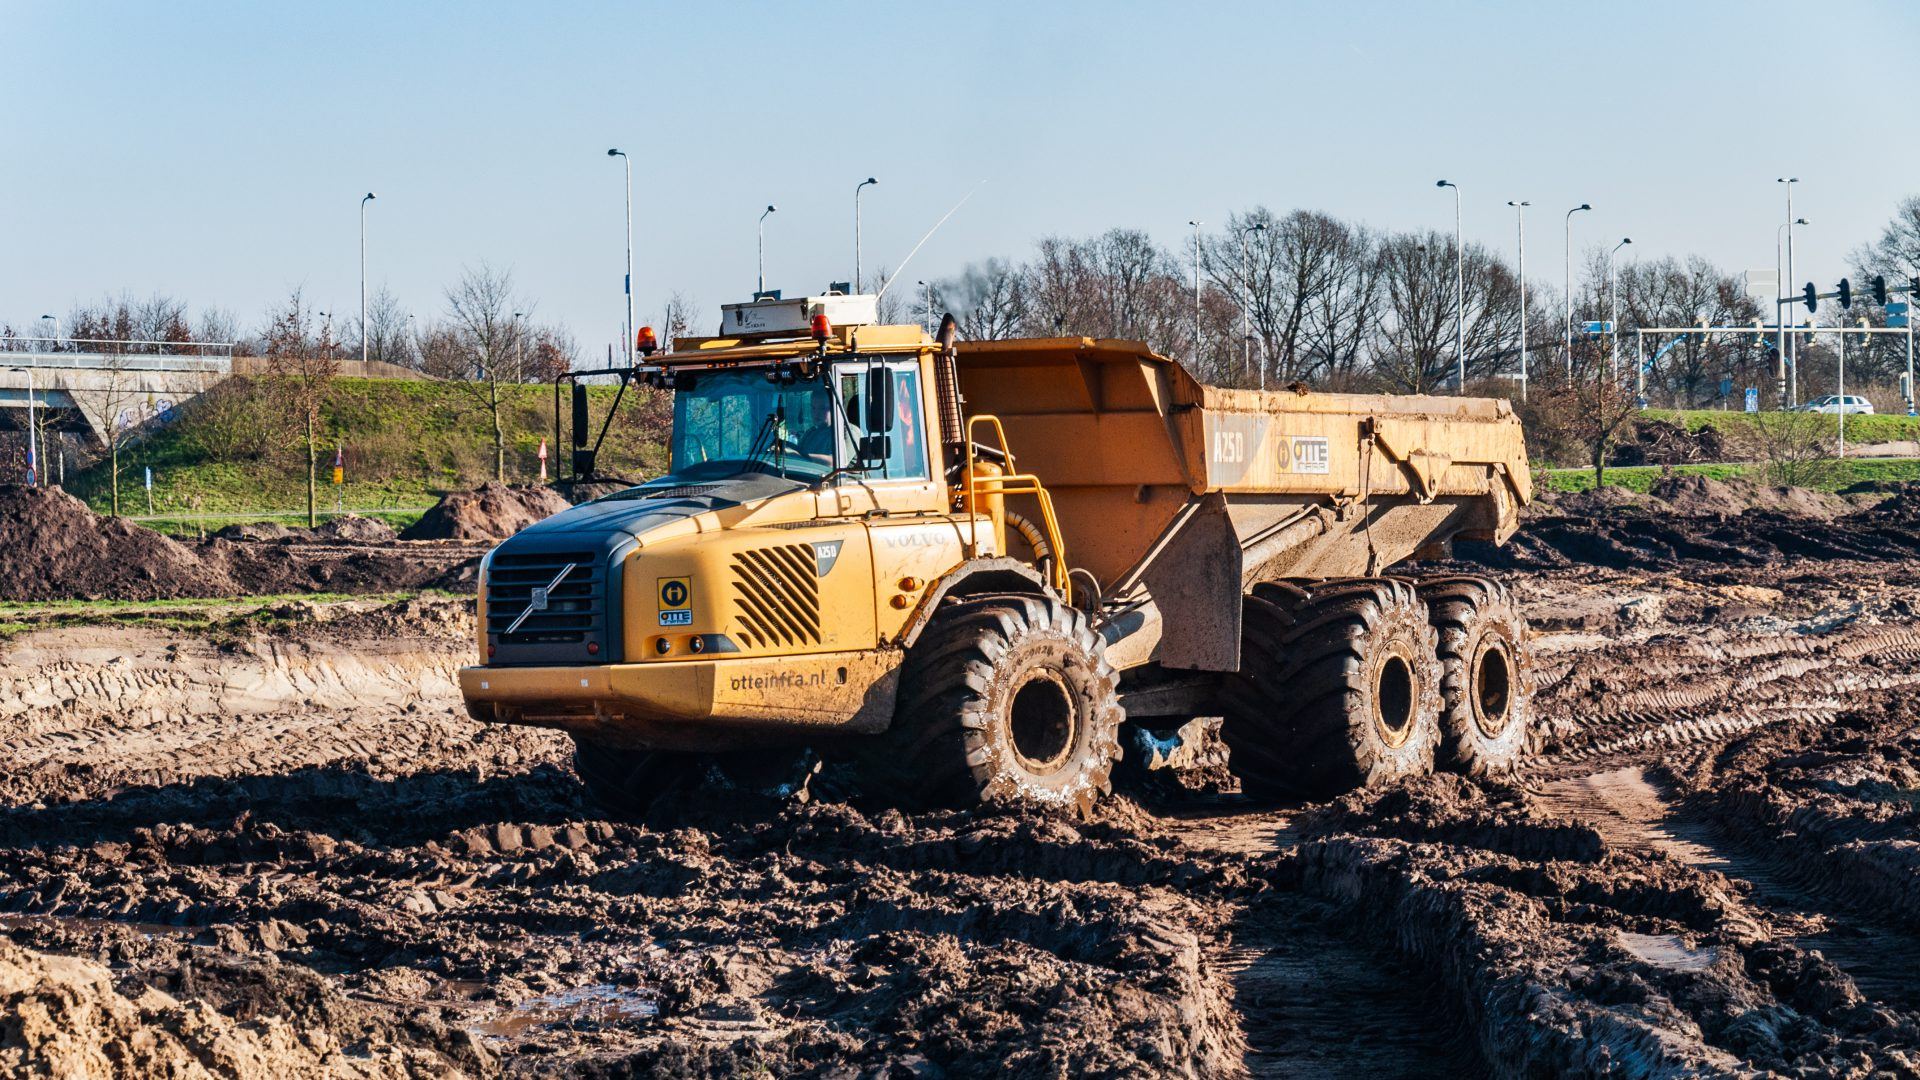 Project A12 Ede grondwerk met shovel en mobiele kraan